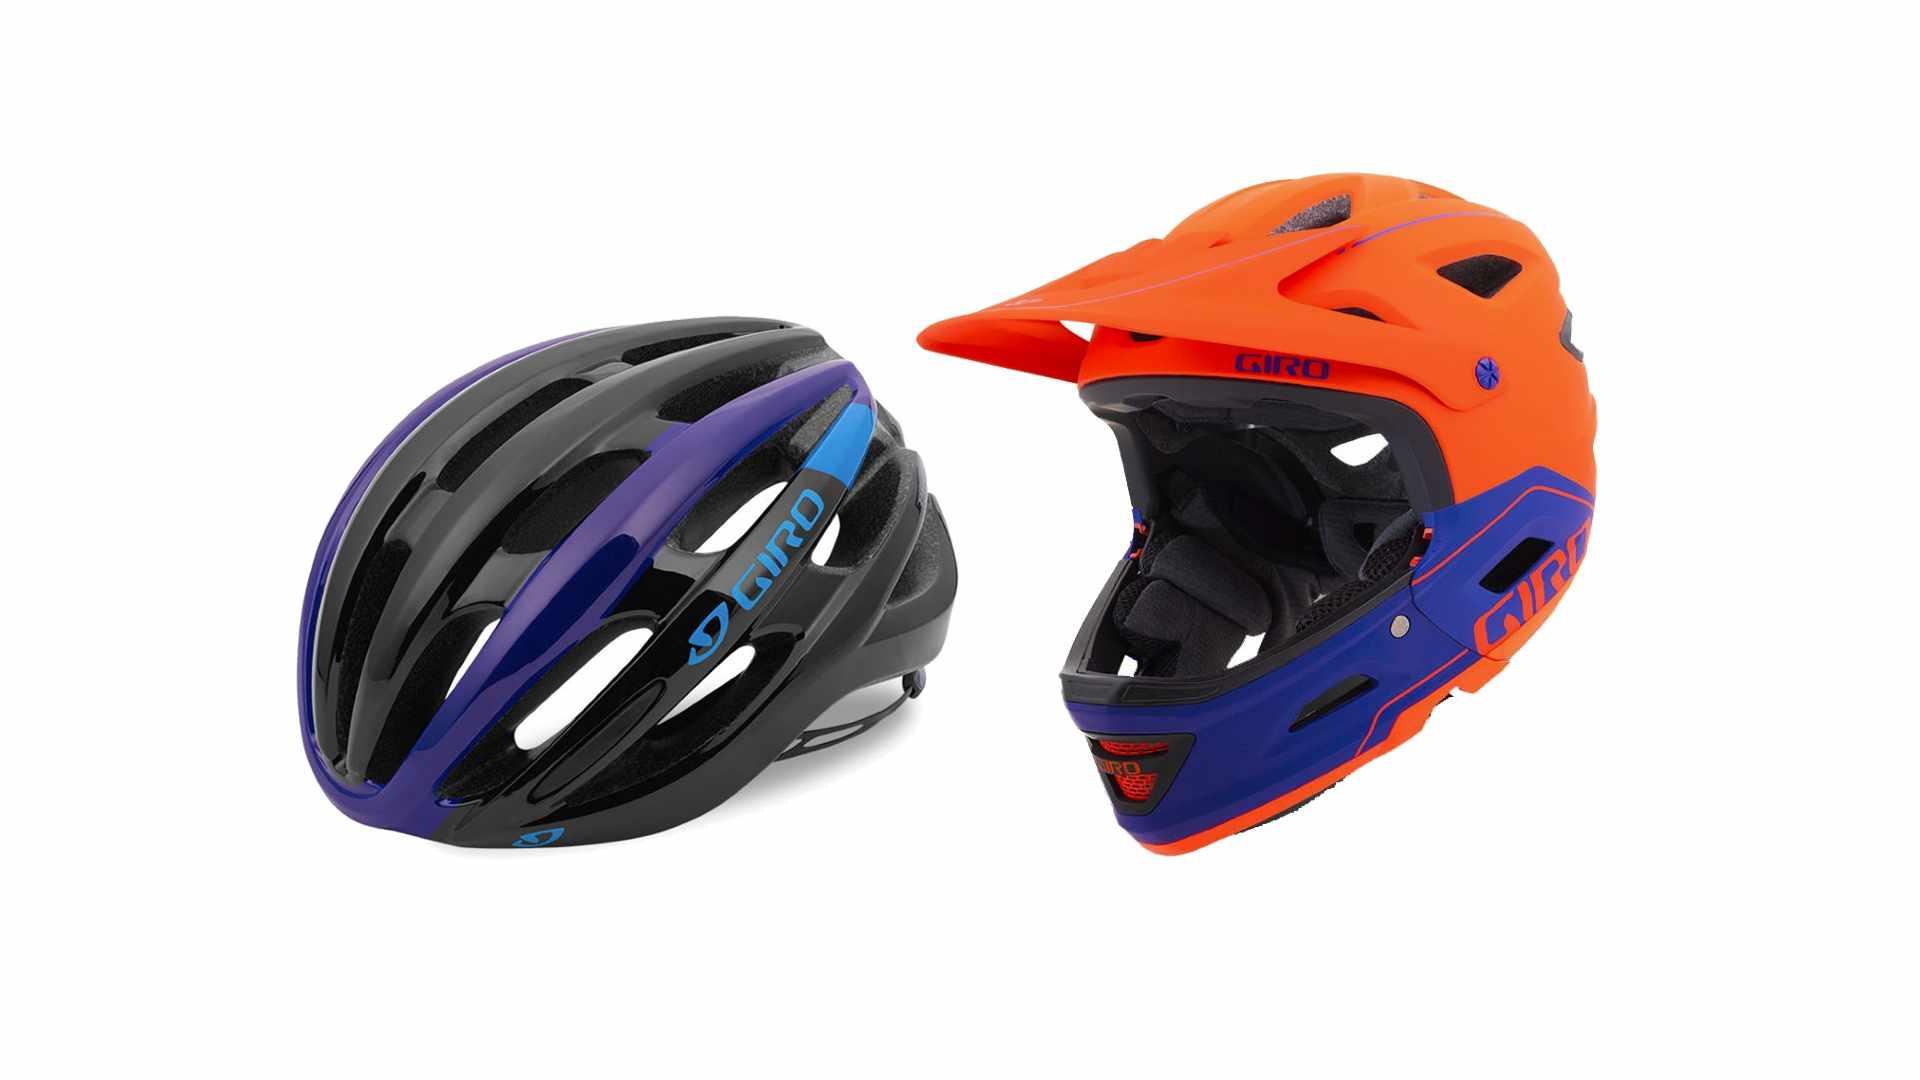 Two bike helmets on a white background